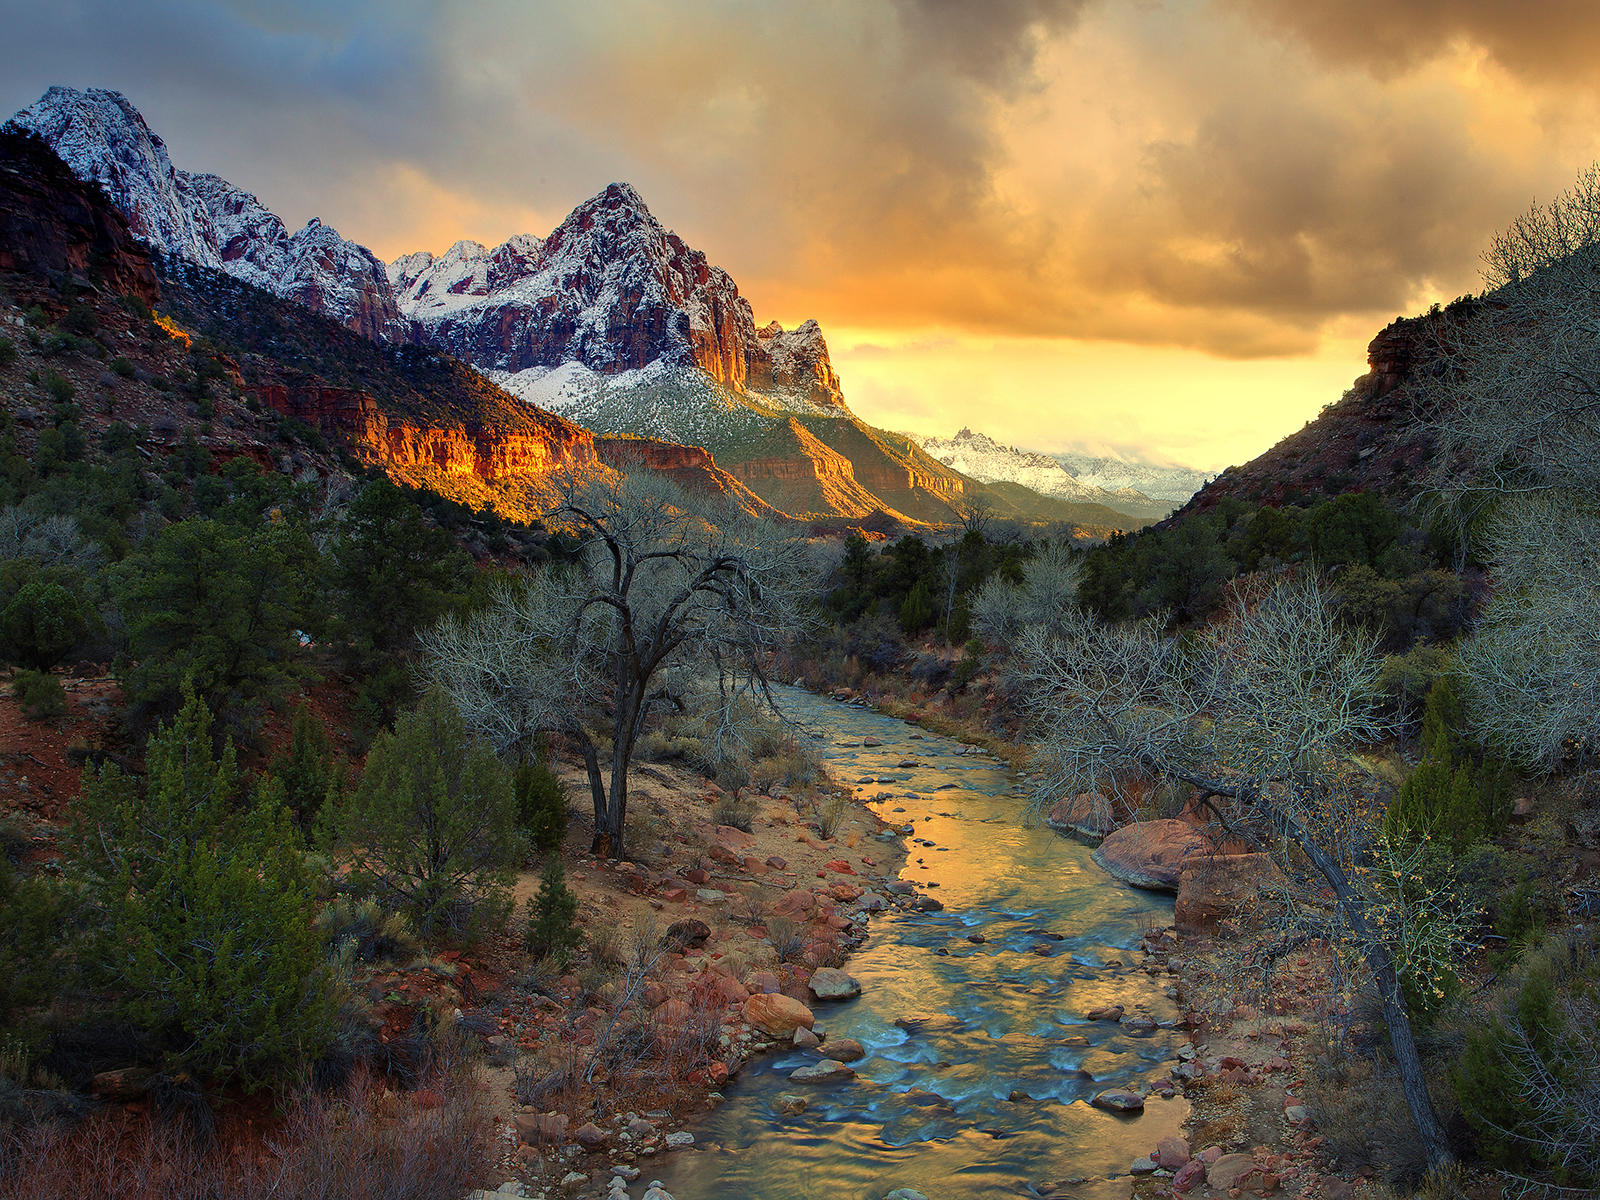 Zion National Park Pictures Wallpaper 1600x1200 8479